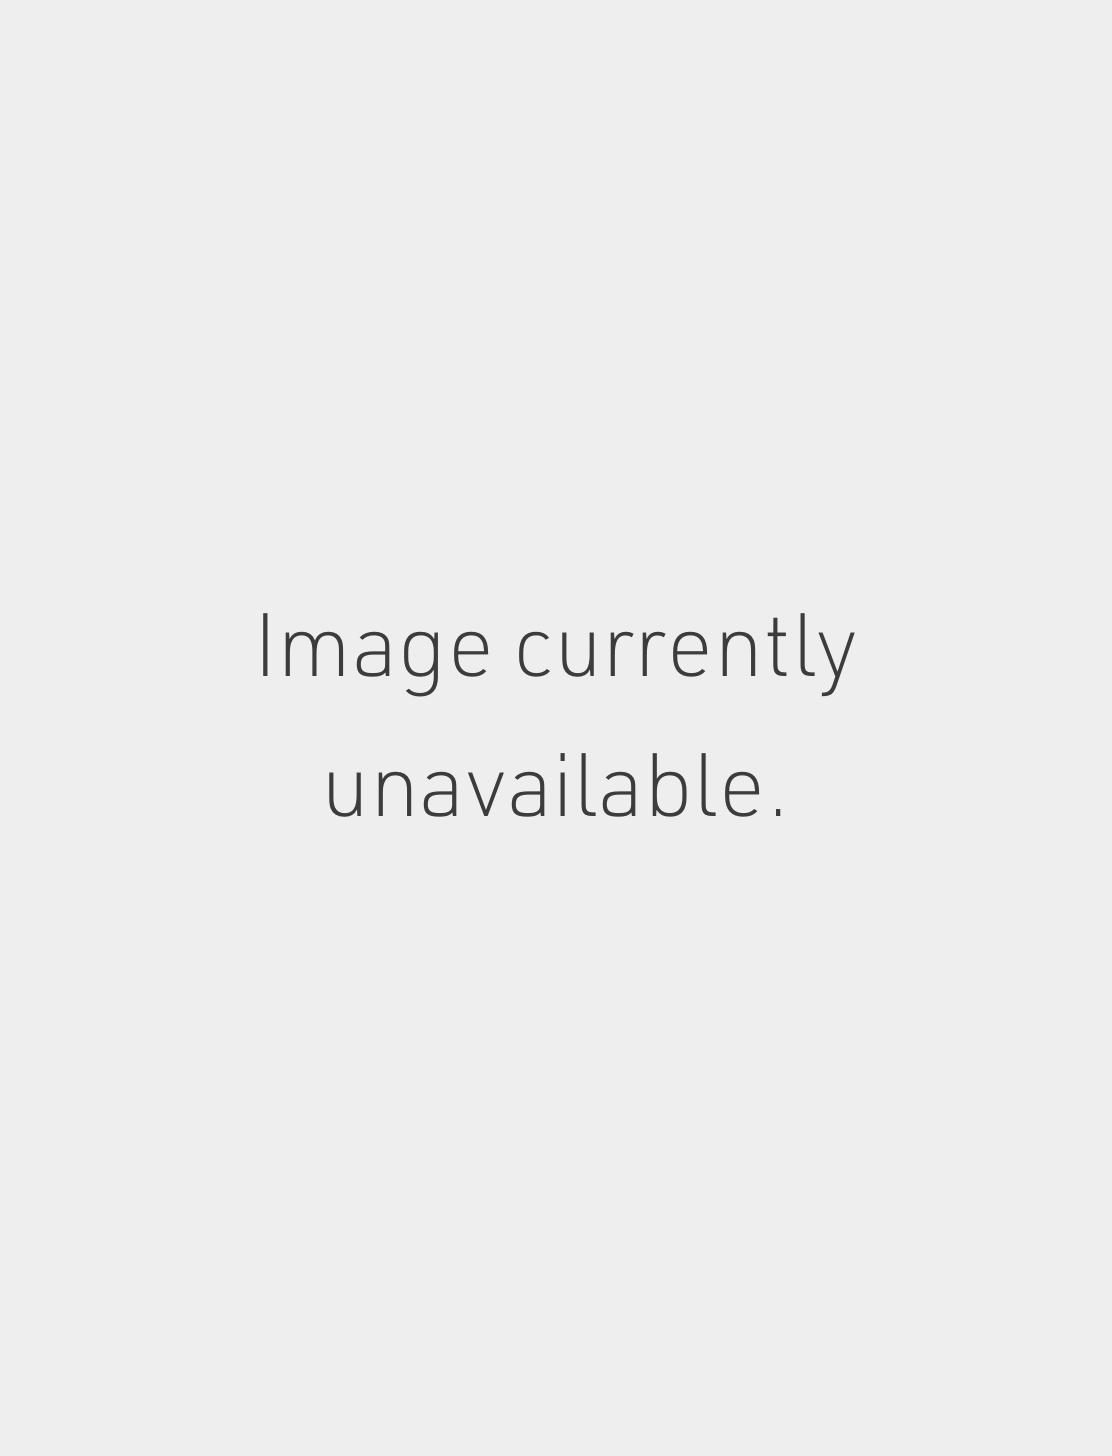 Diamond Lucky Clover Nostril Screw - WHITE GOLD - LEFT Image #2